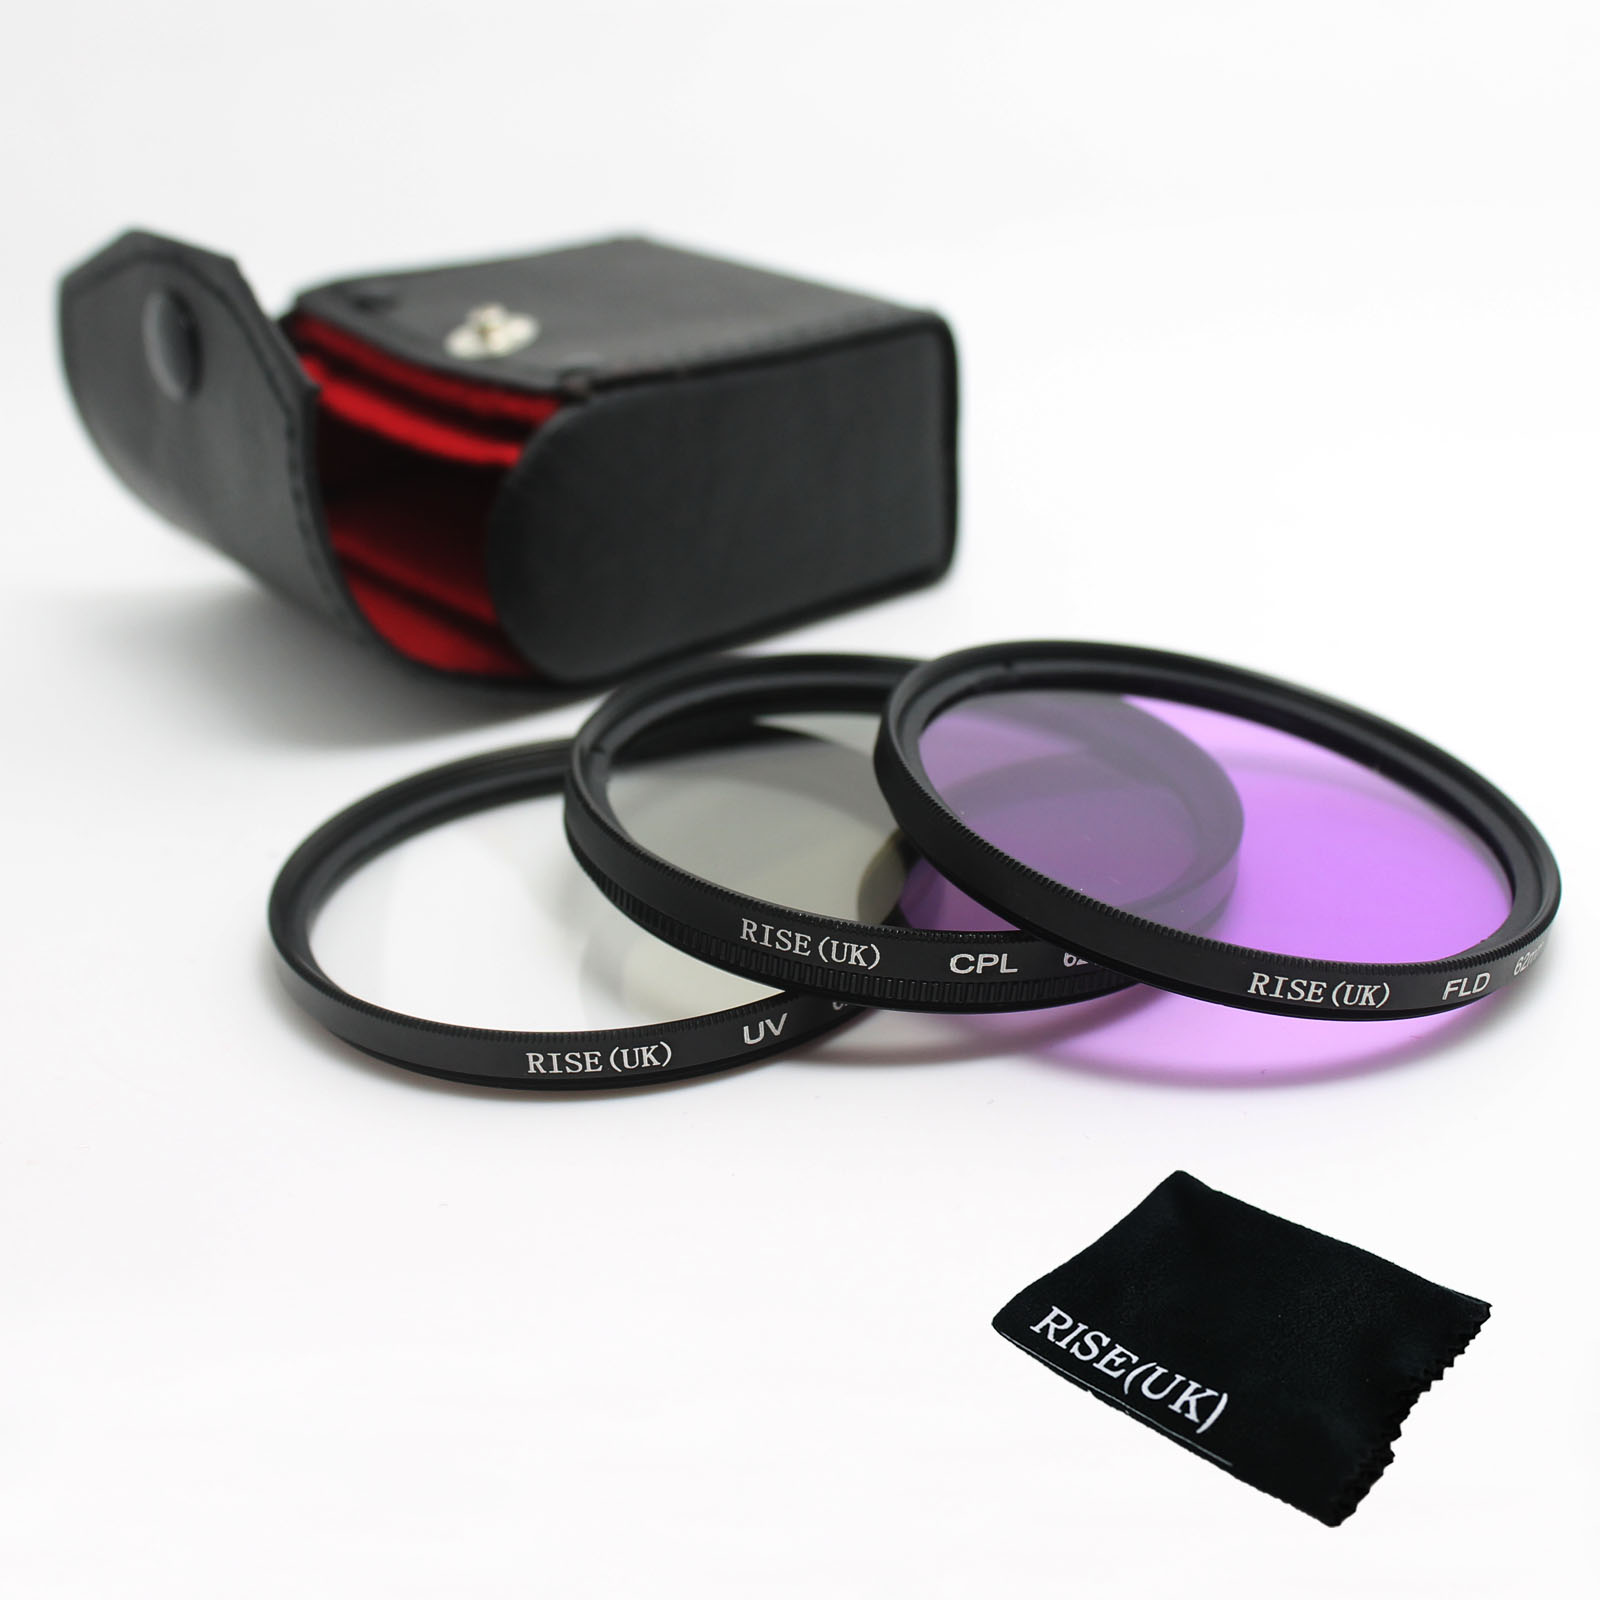 RISE(UK) 49mm 52mm 55 mm 58mm 62mm 67mm 72mm 77mm UV + FLD + CPL Lens Filter Protector for canon nikon pentax sony dslr camera